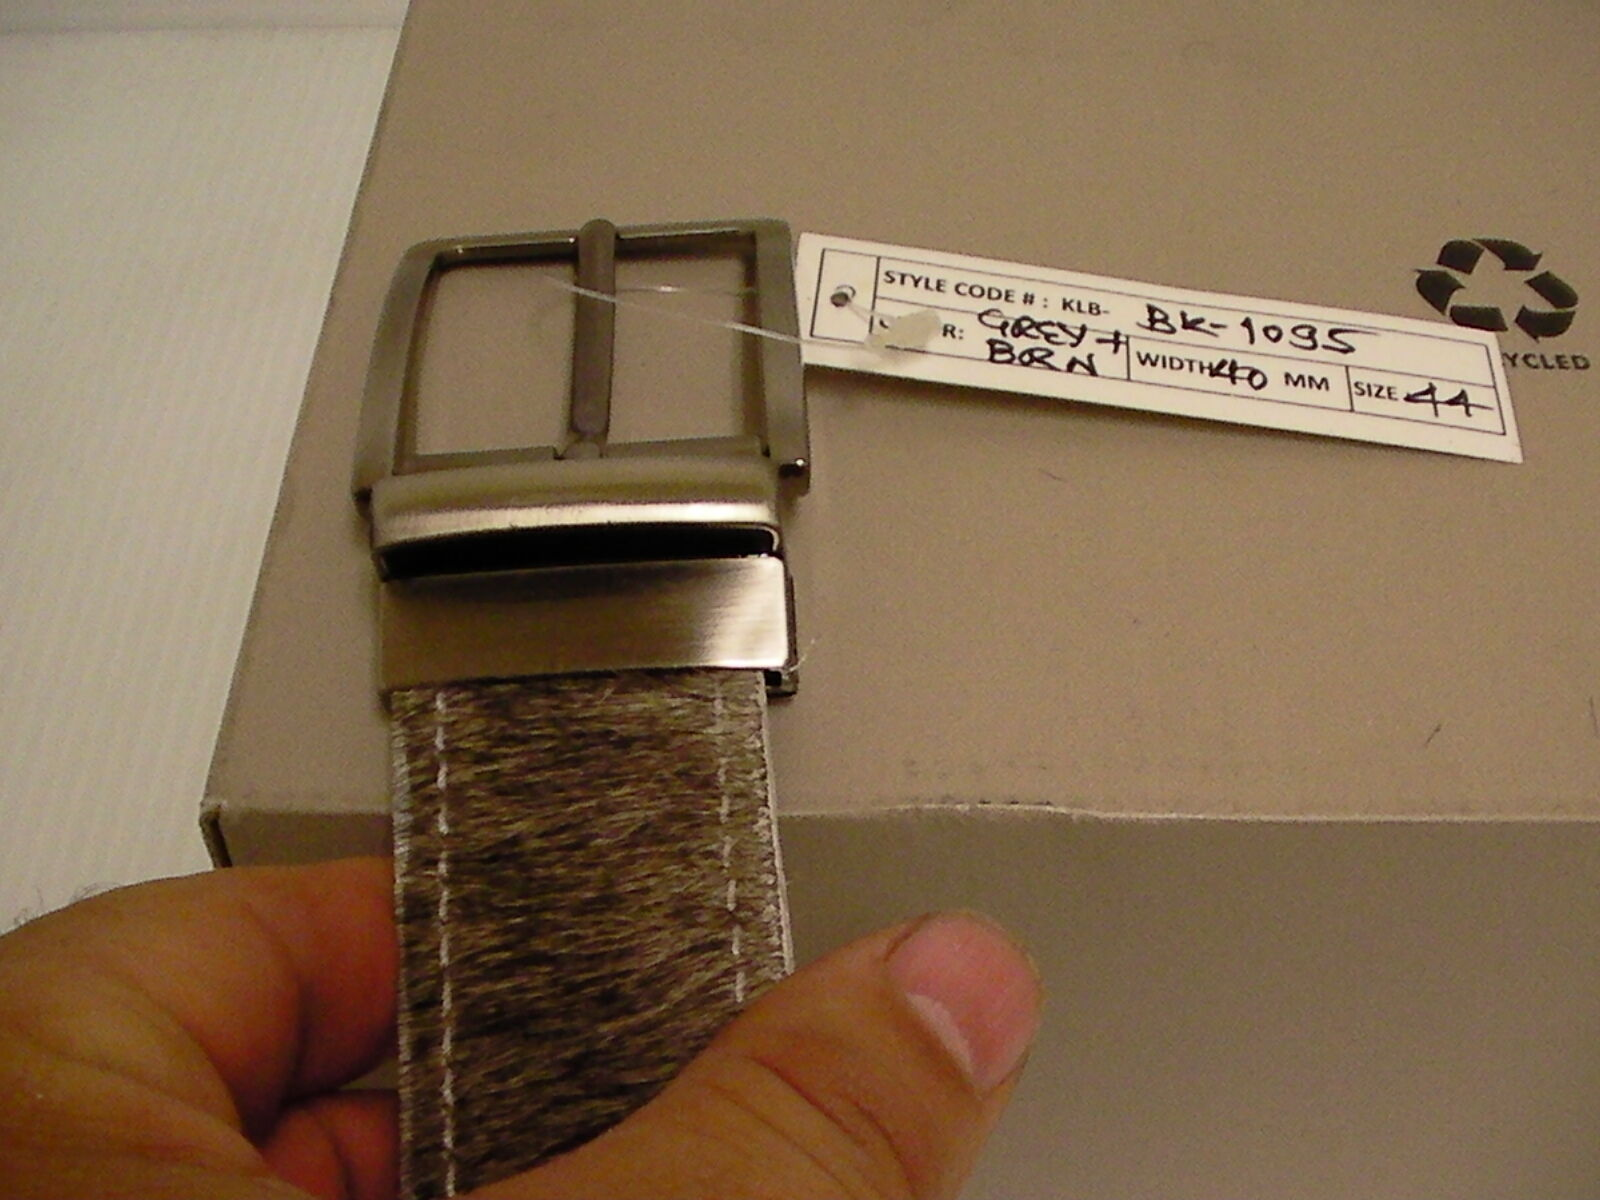 Echt Rindsleder Haare Leder Wendbarer Gürtel Graubraun Größe 91.4cm 91.4cm 91.4cm Länge Neu | Spezielle Funktion  e3f652